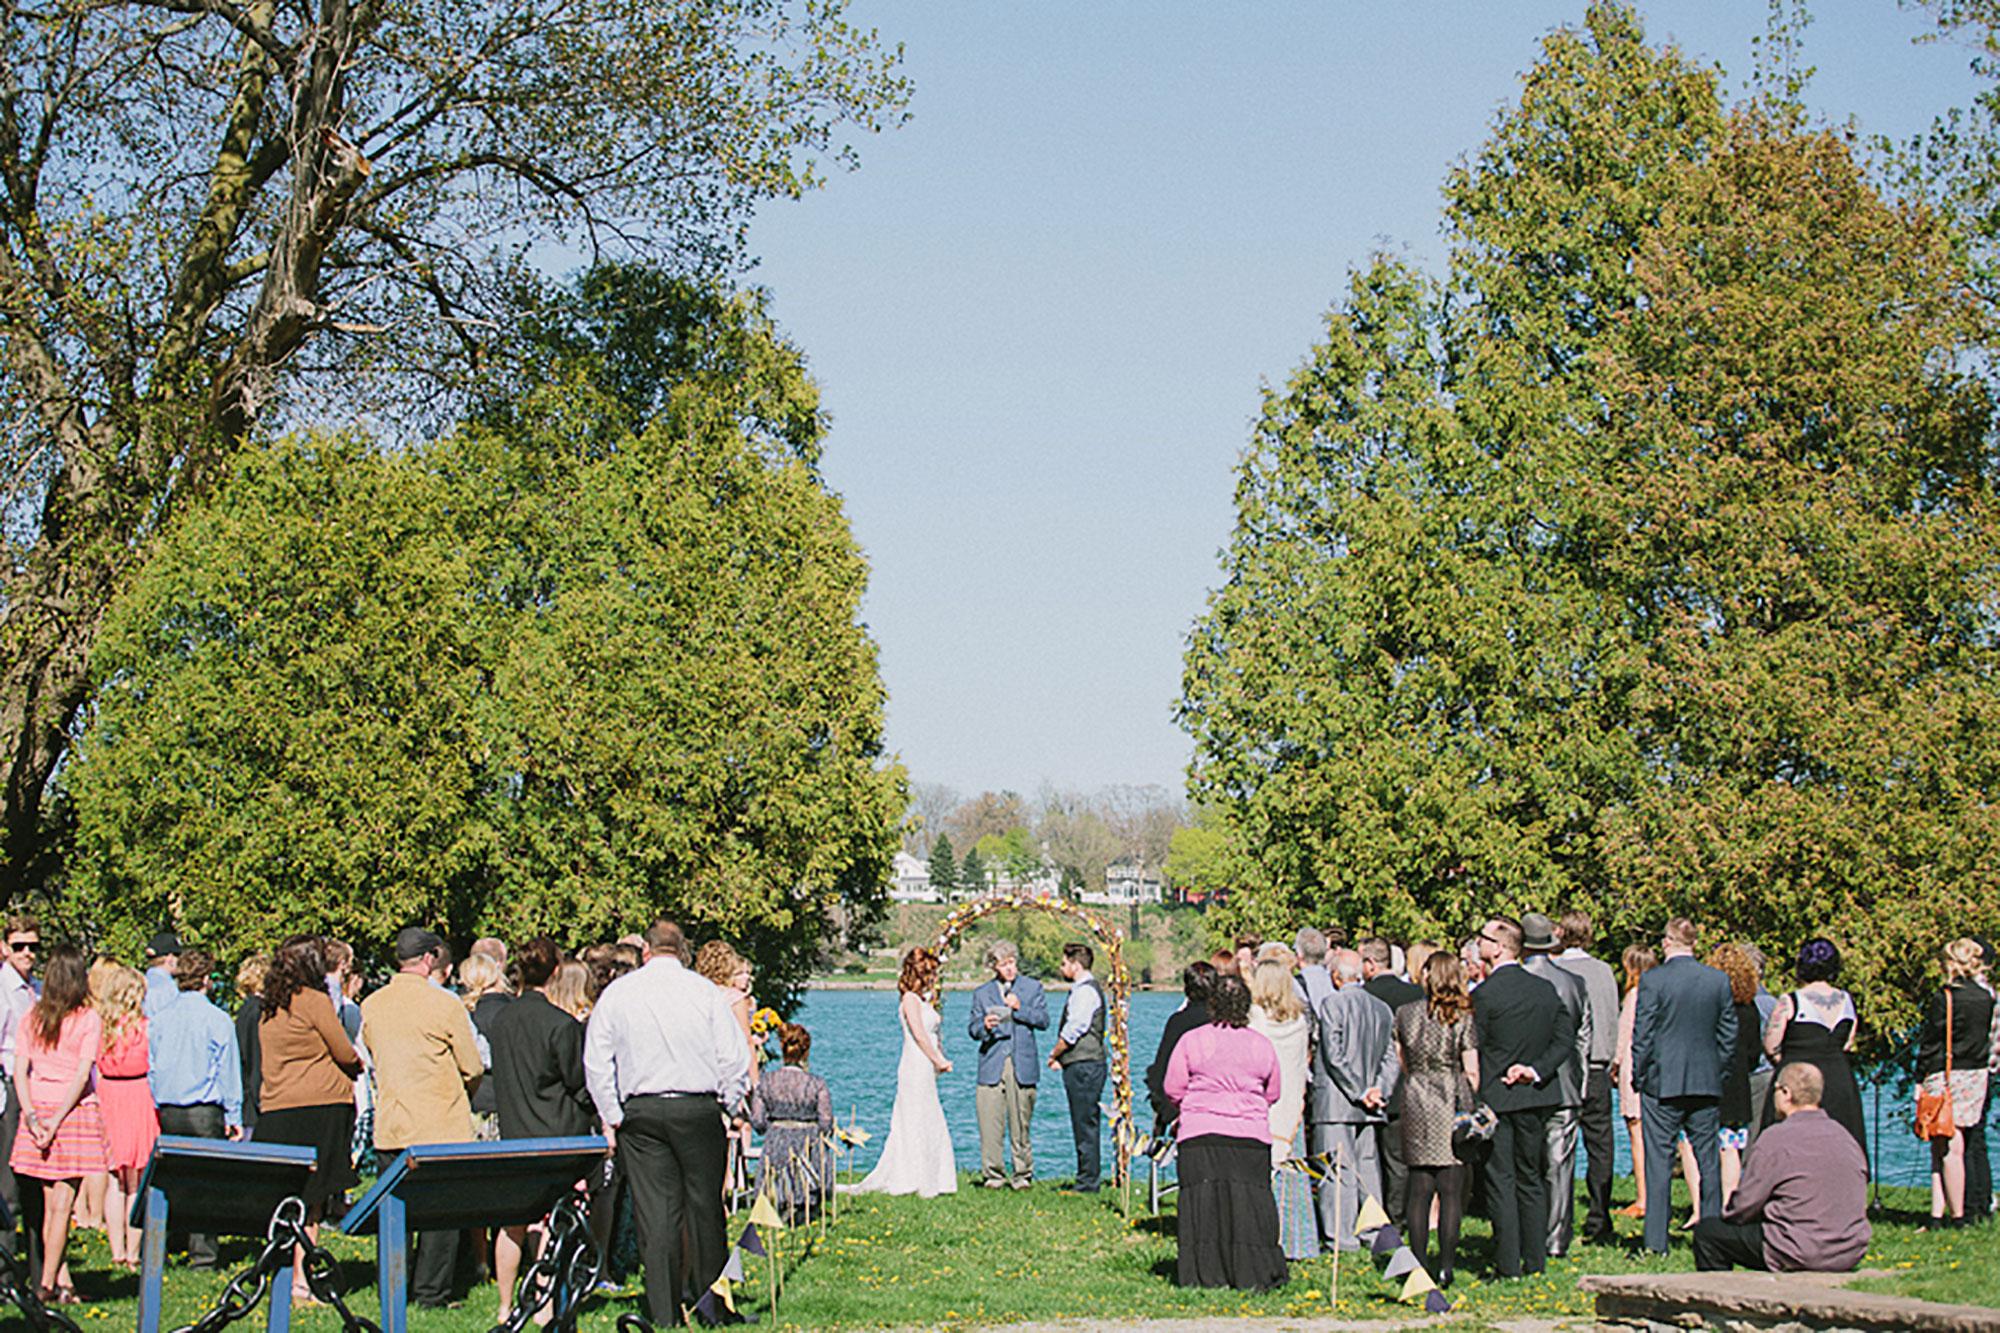 Navy-Hall-Wedding-Vineyard-Bride-Photo-By-Andrew-Mark-Photography-031.jpg